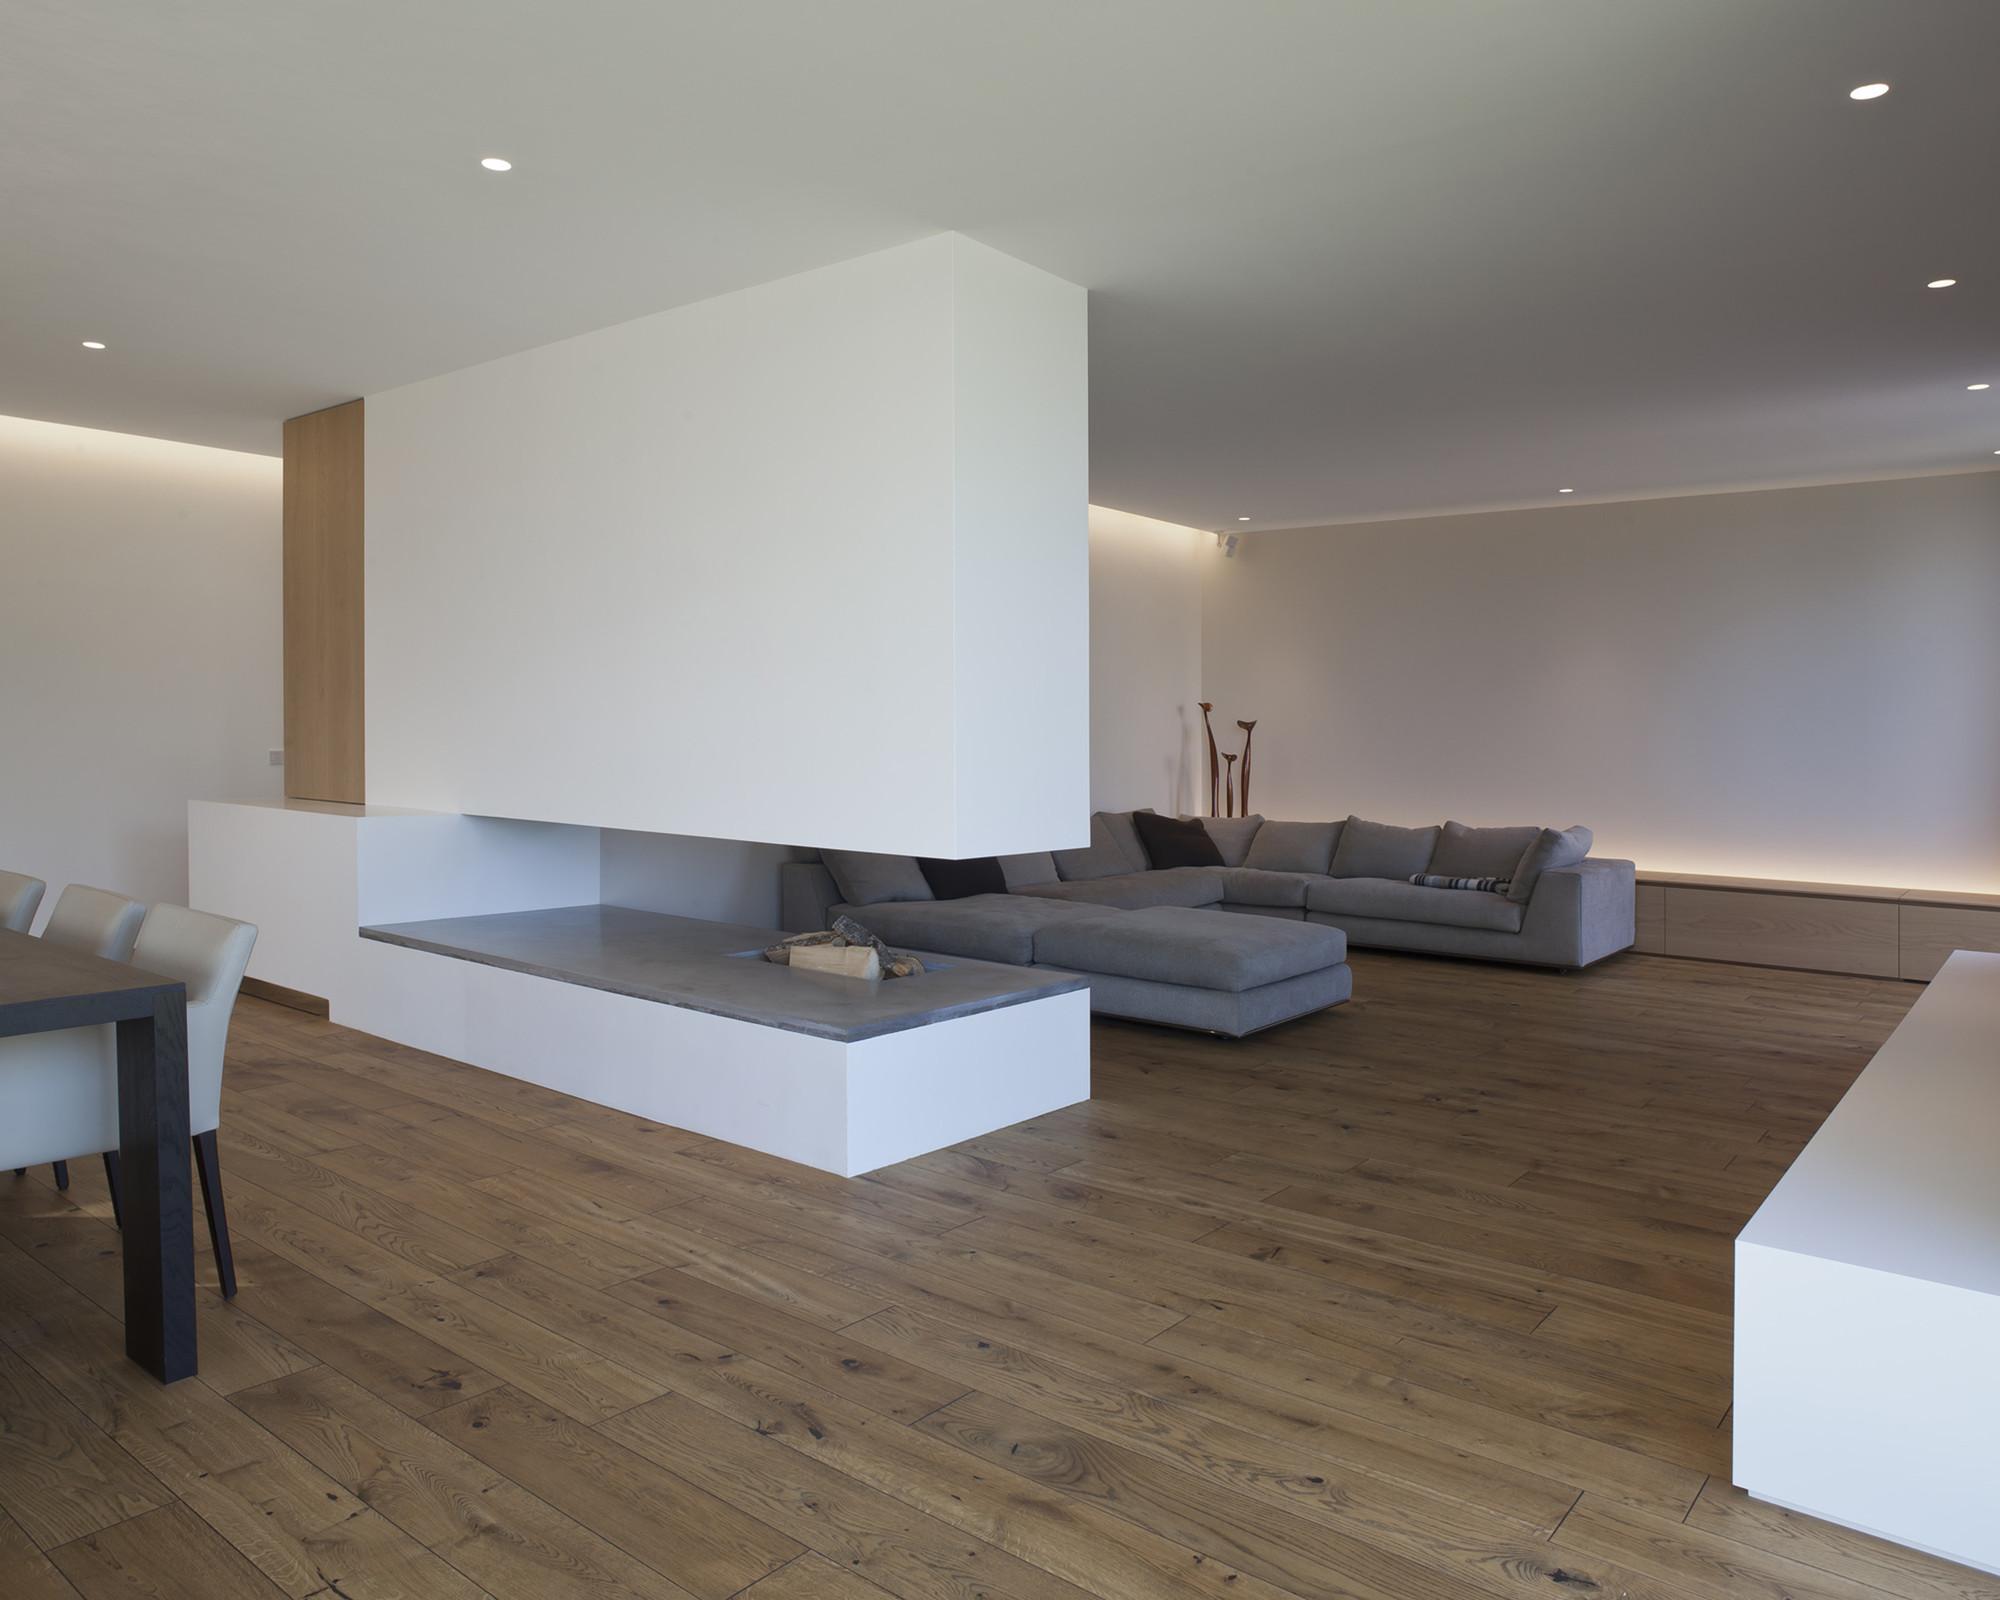 gallery of house p frohring ablinger architekten 4. Black Bedroom Furniture Sets. Home Design Ideas